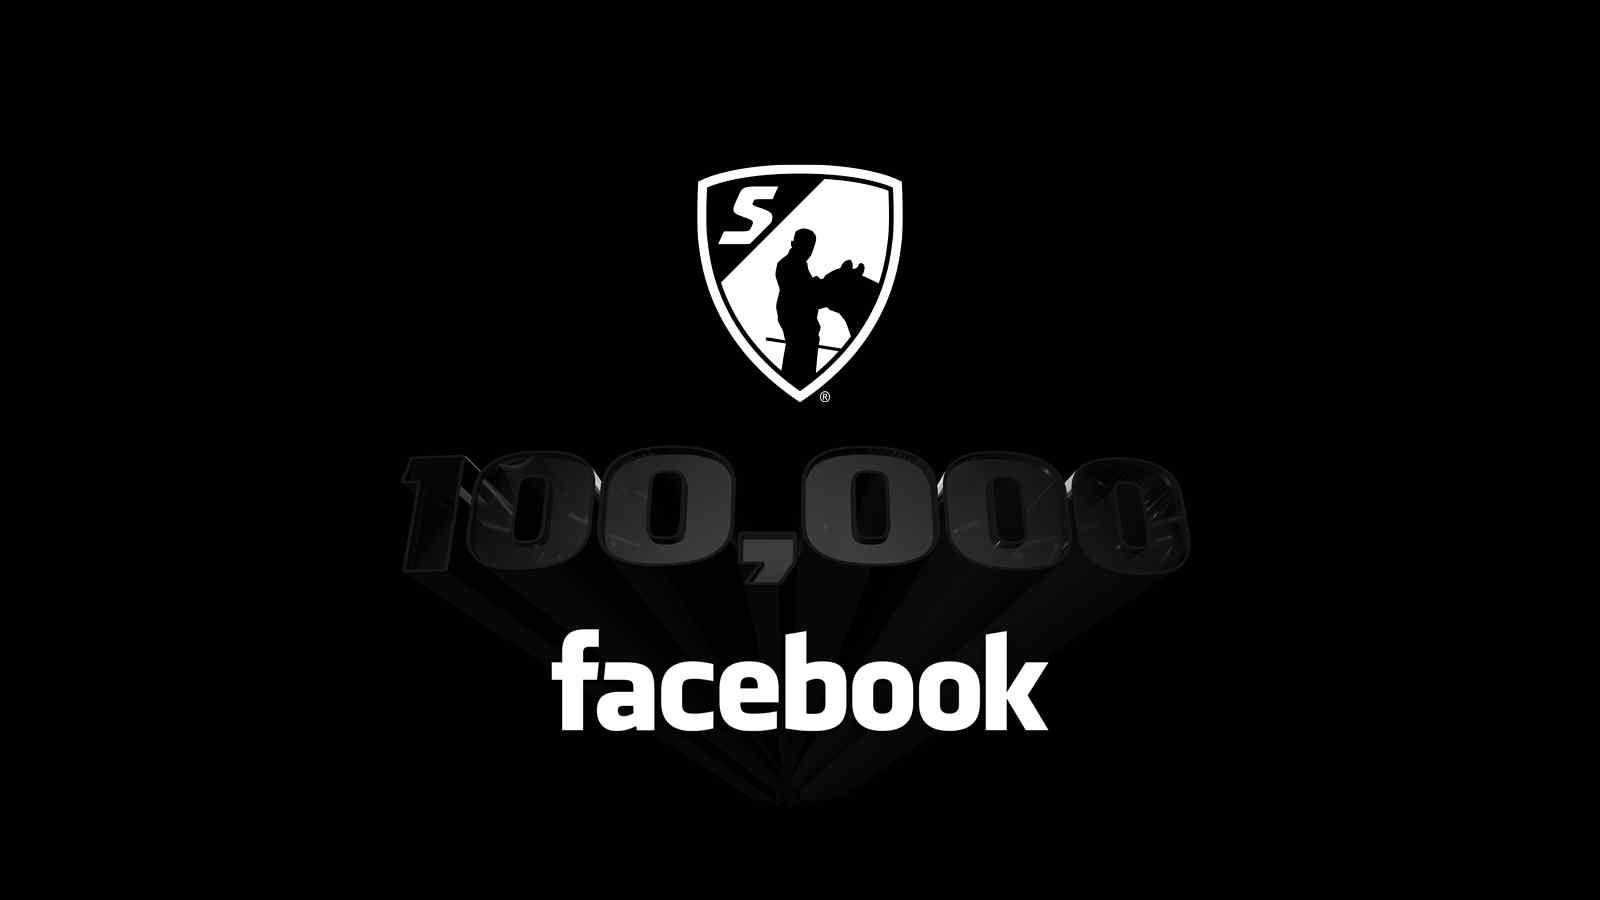 100,000 Facebook